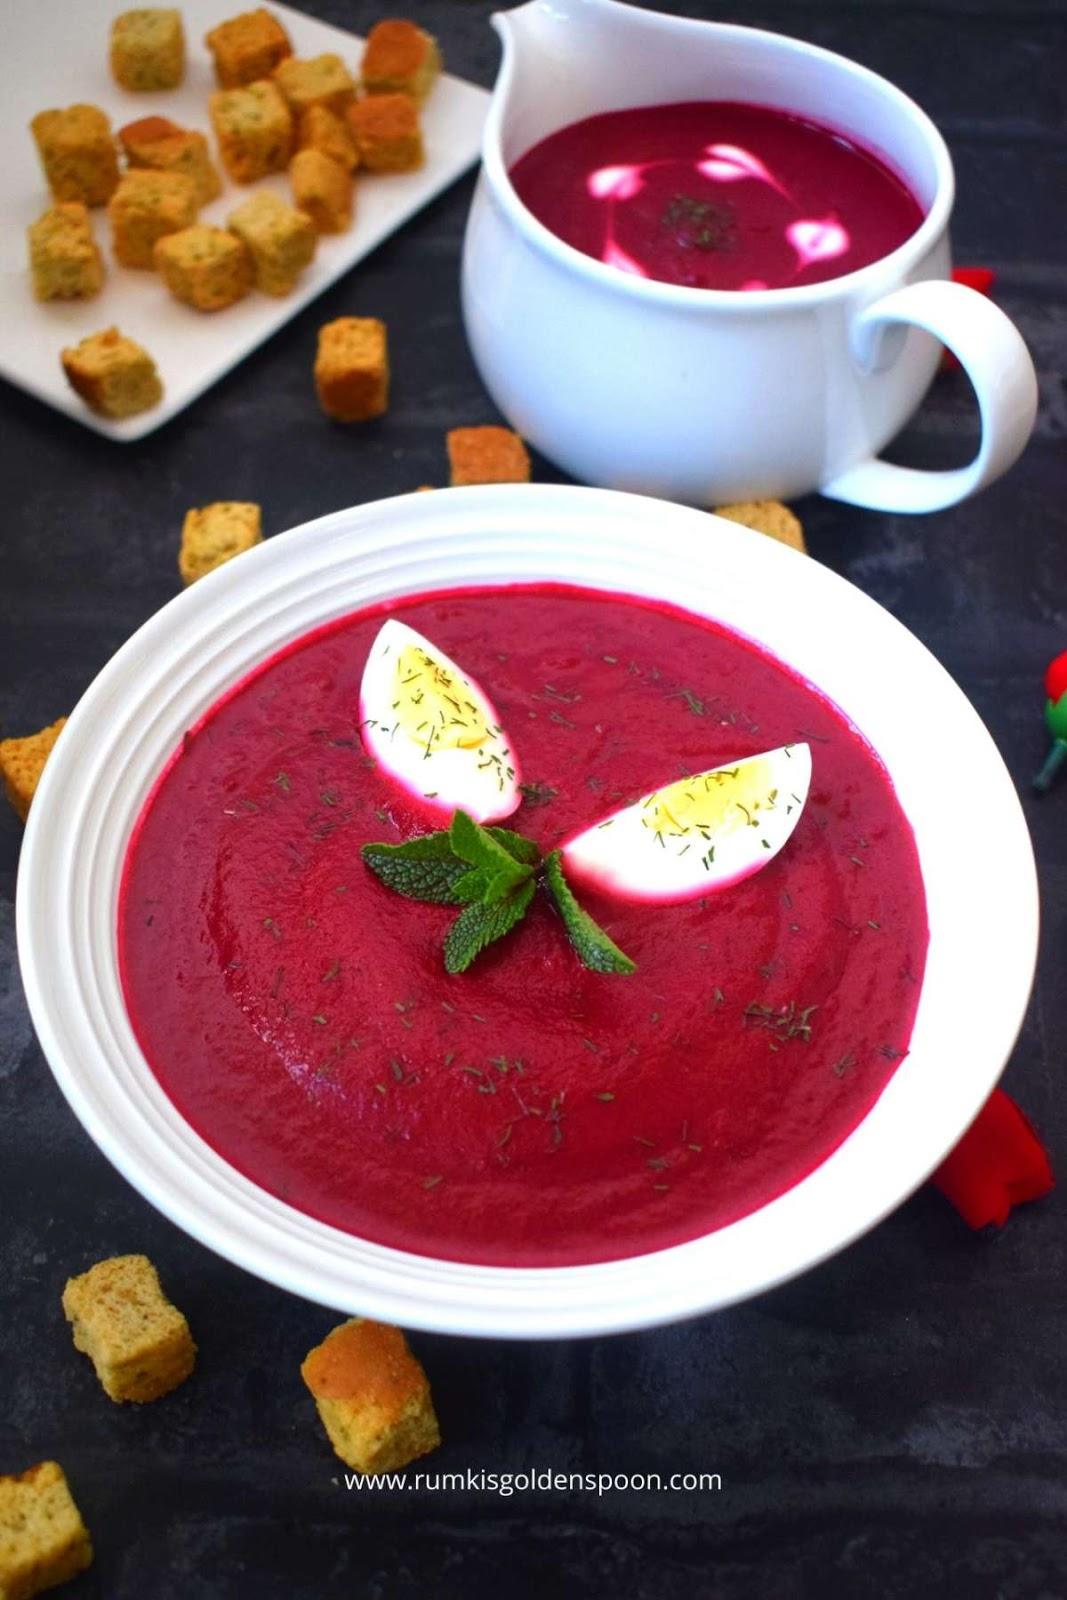 valentine recipe, recipe for valentine's day, valentine's day recipe, valentine recipes, valentine recipe dinner, beetroot soup, beetroot recipe, beetroot recipes, beetroot recipes easy, beetroot soup recipe, beetroot soup polish, polish beetroot soup, soup recipe vegetable, soup recipe vegetarian, soup recipe best, soup recipe easy, soup recipes veg, soup recipe healthy, recipe for beetroot, recipe of beetroot, borscht recipe, recipe of borscht, recipe for borscht soup, borscht recipe vegetarian, beet soup, Rumki's Golden Spoon